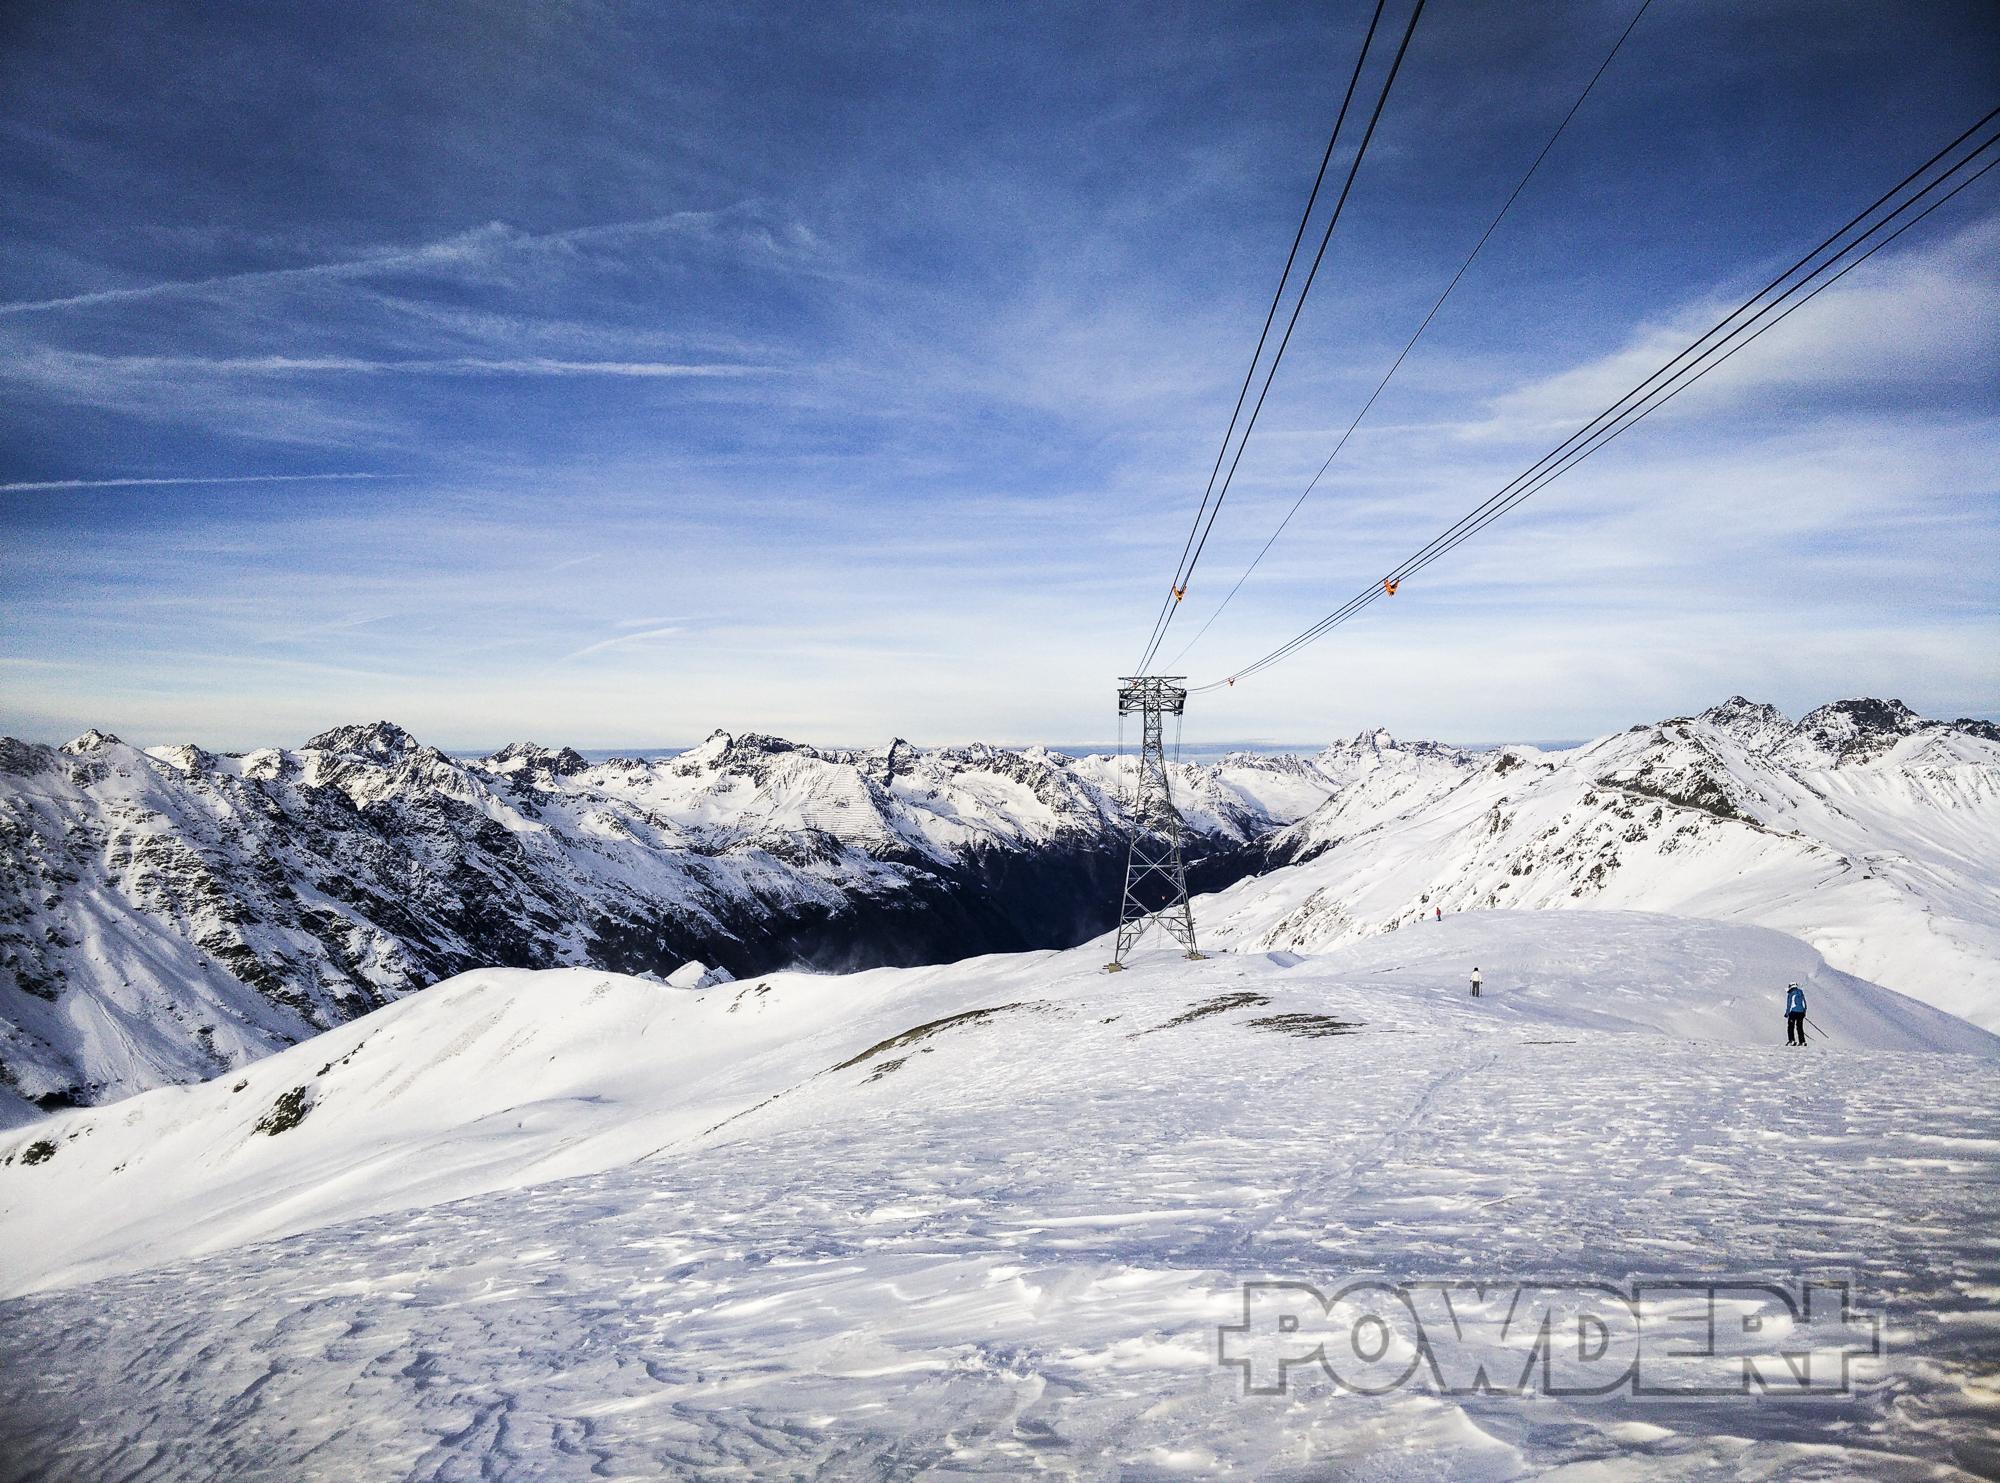 Ischgl, wenn der Schnee fehlt, Klimaerwärmung, Freeride 2.0, Stolperskifahren, tirol, freeride, Val Gronda, Piz Val Gronda, Kuhstall